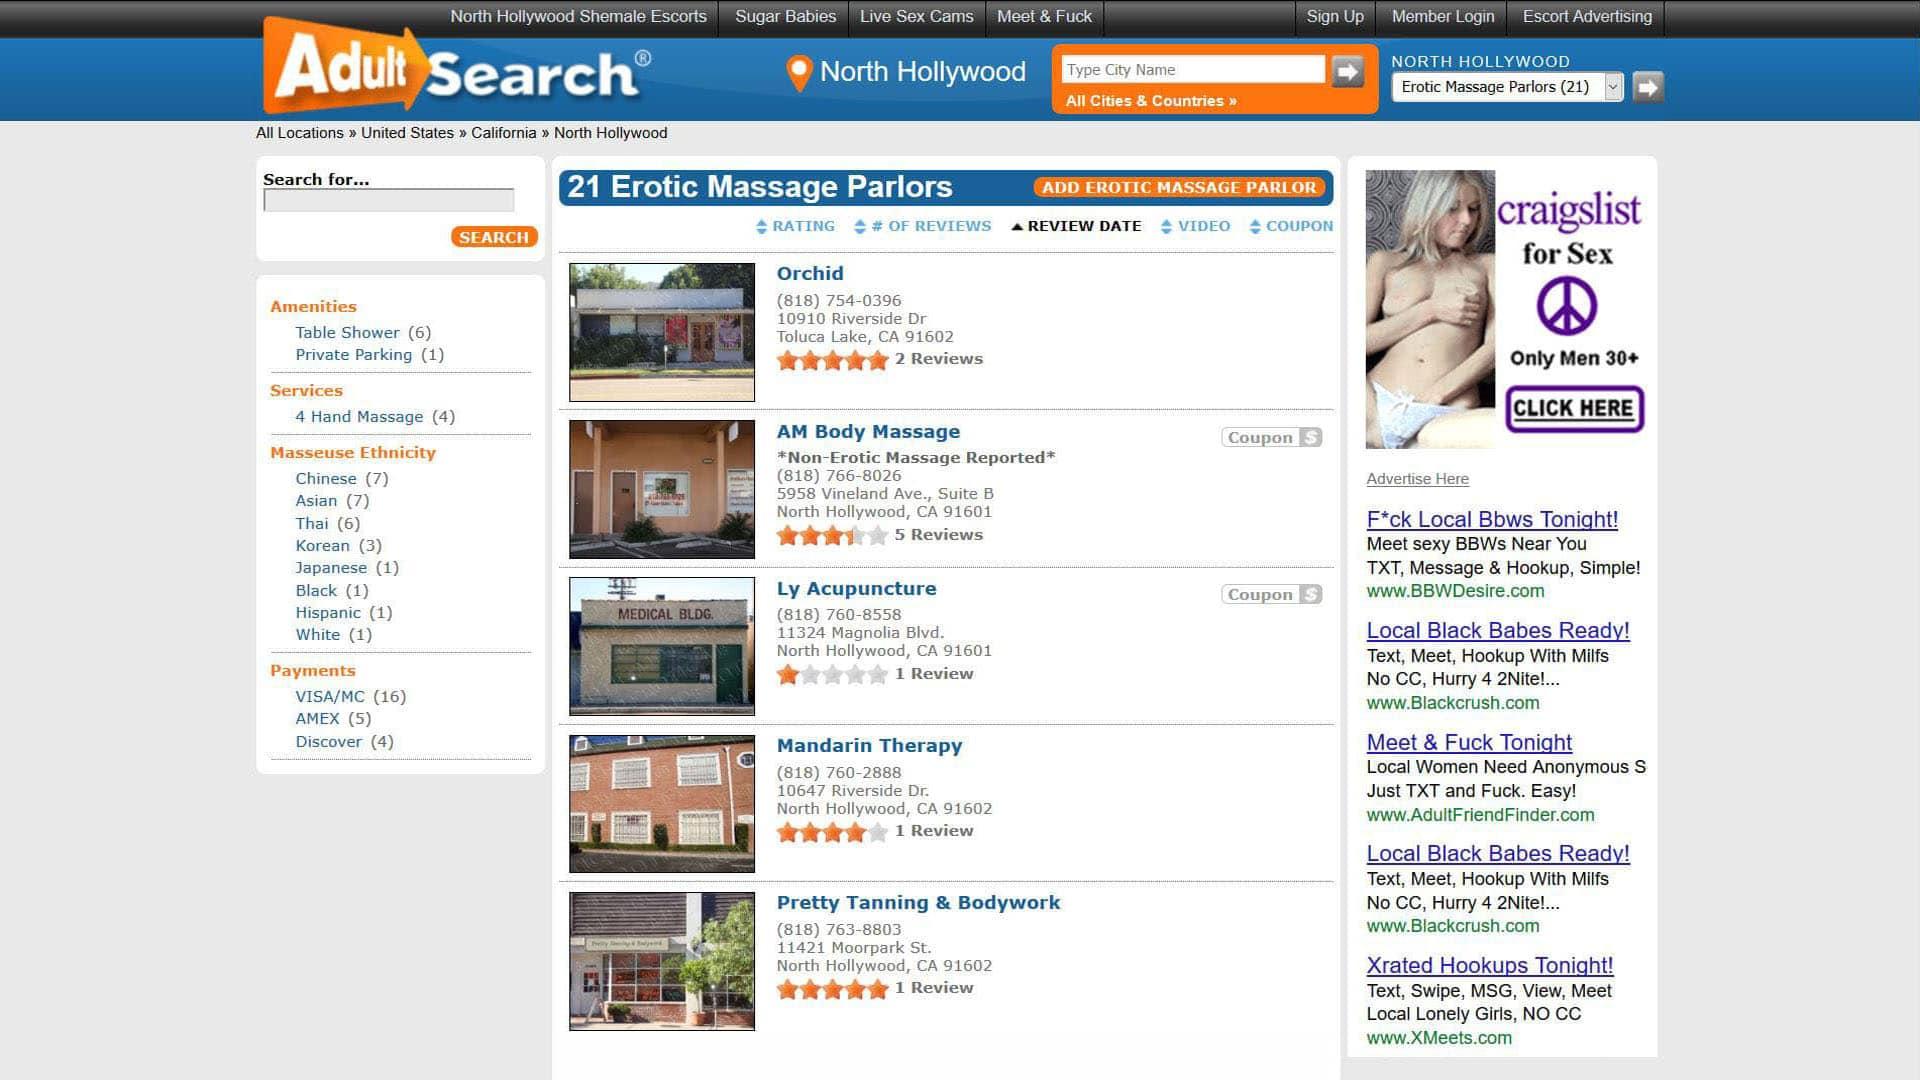 AdultSearch Erotic Massage Parlors